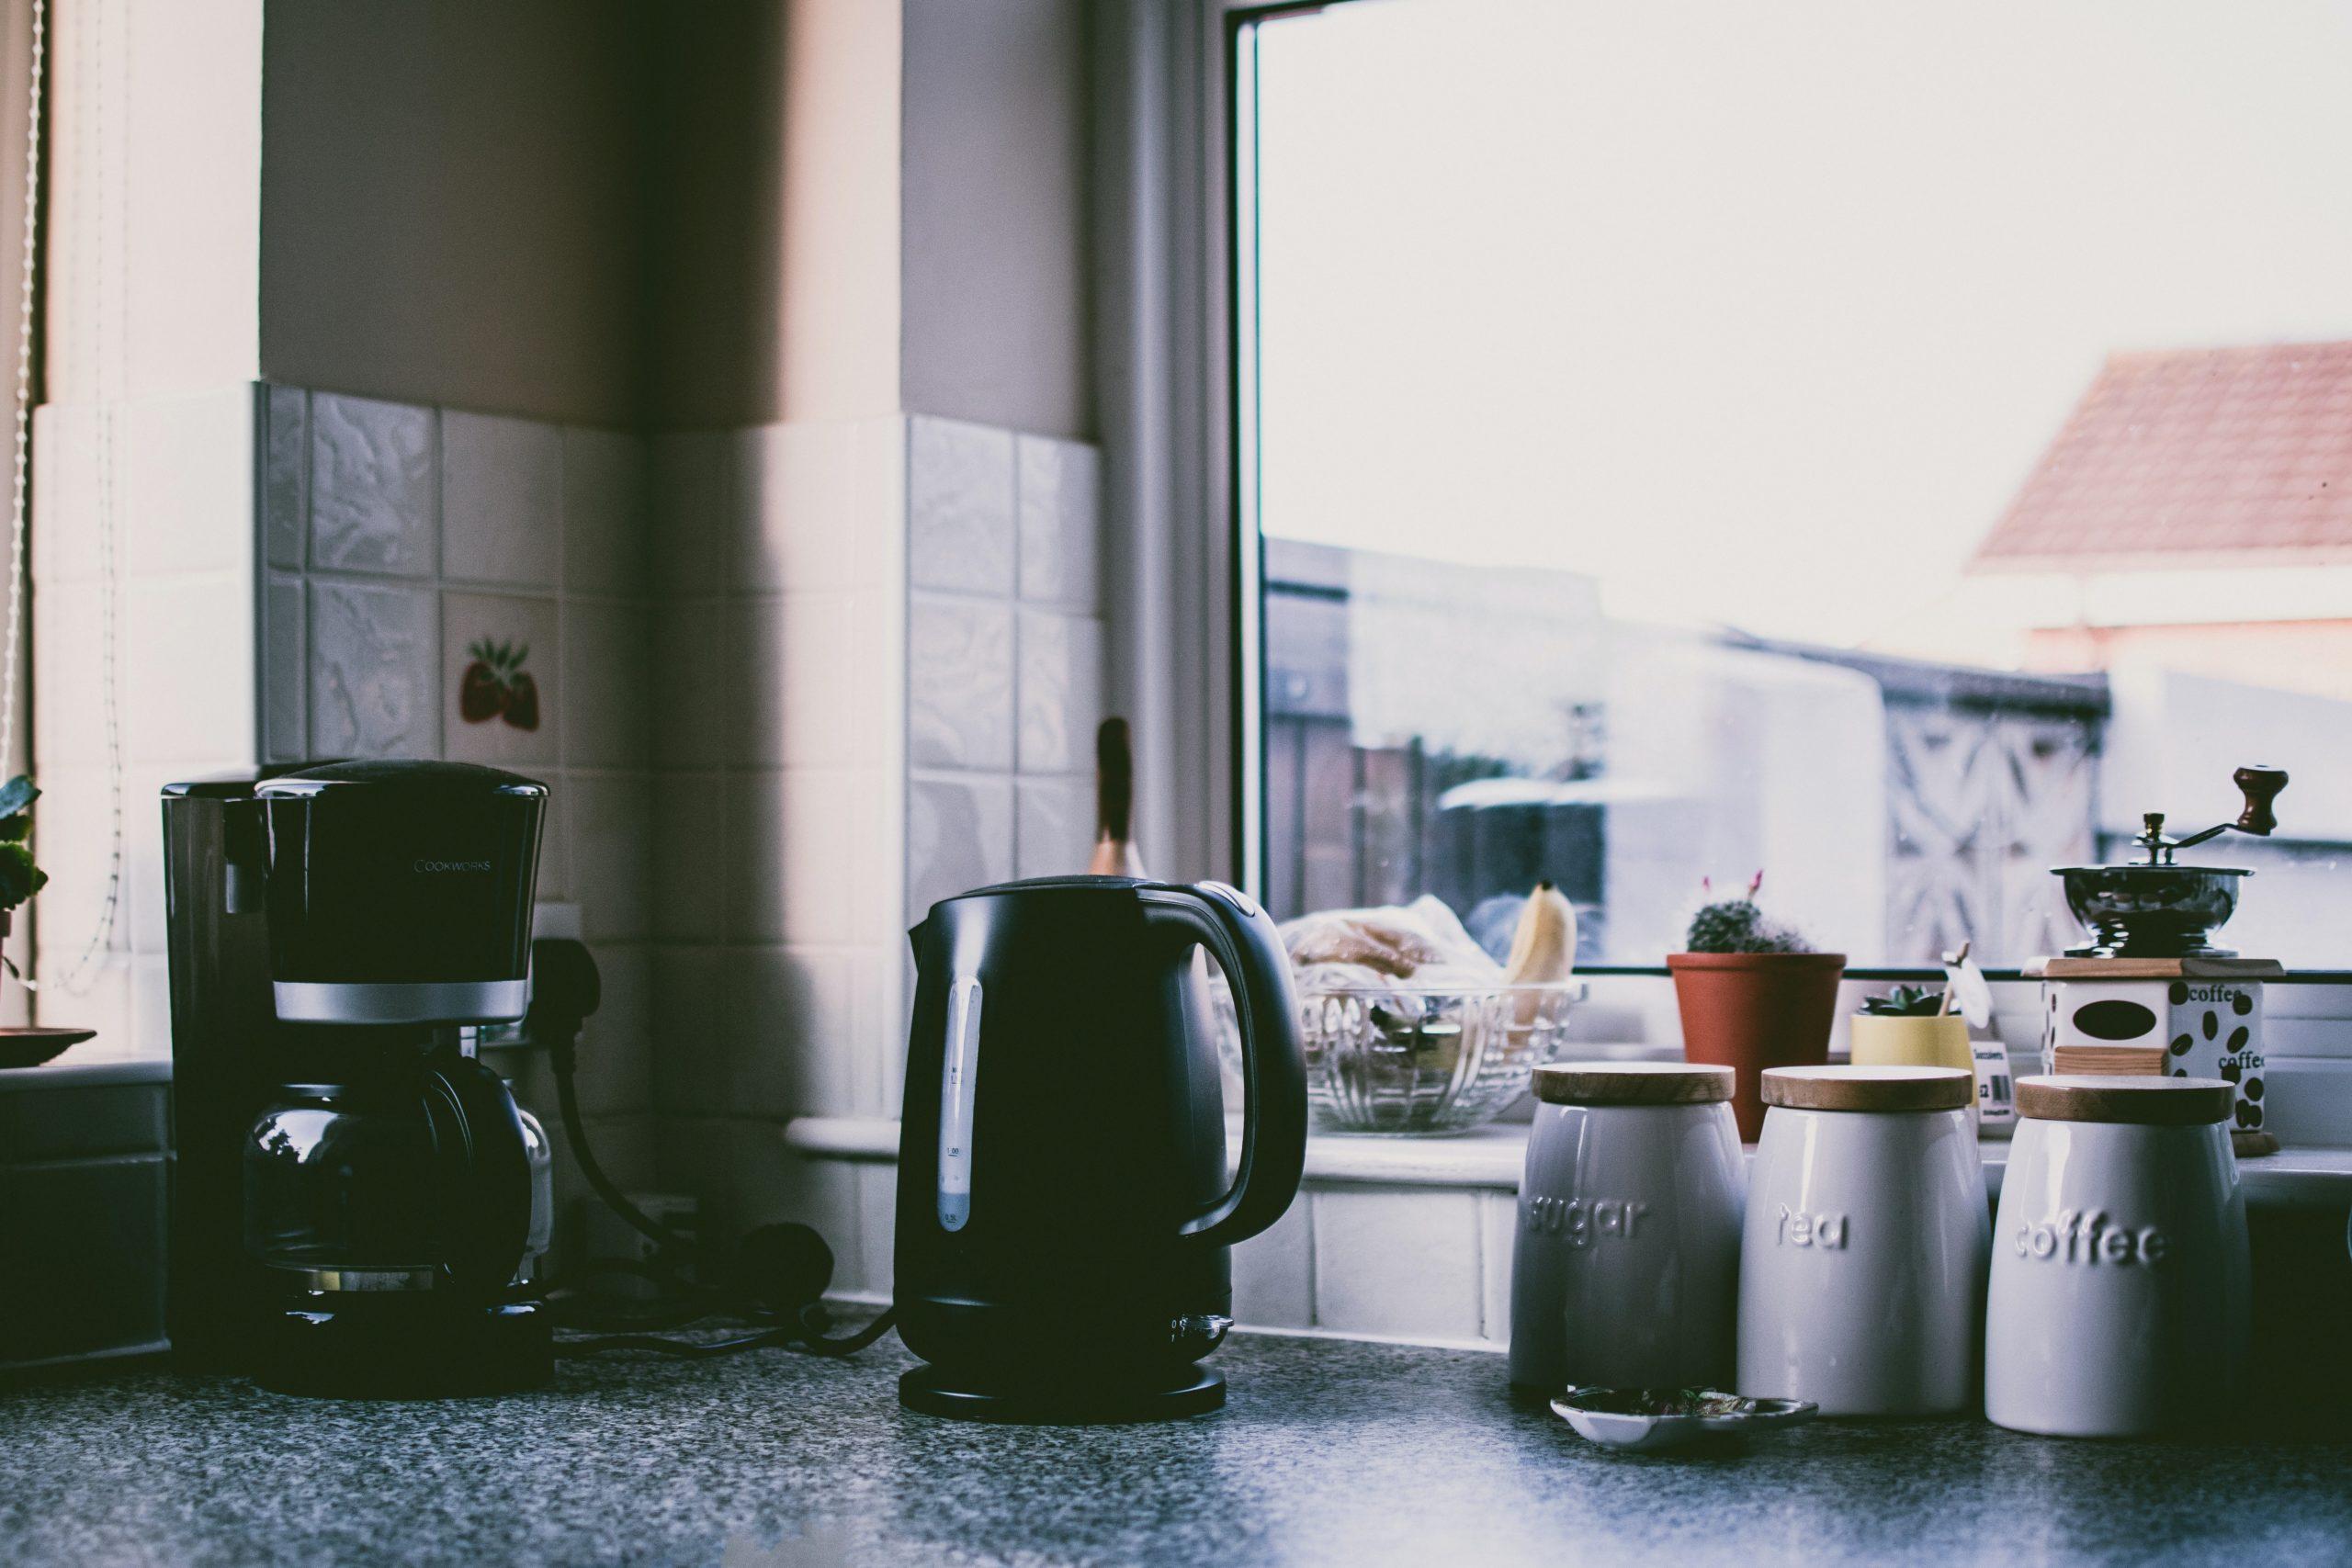 coffee machine on counter